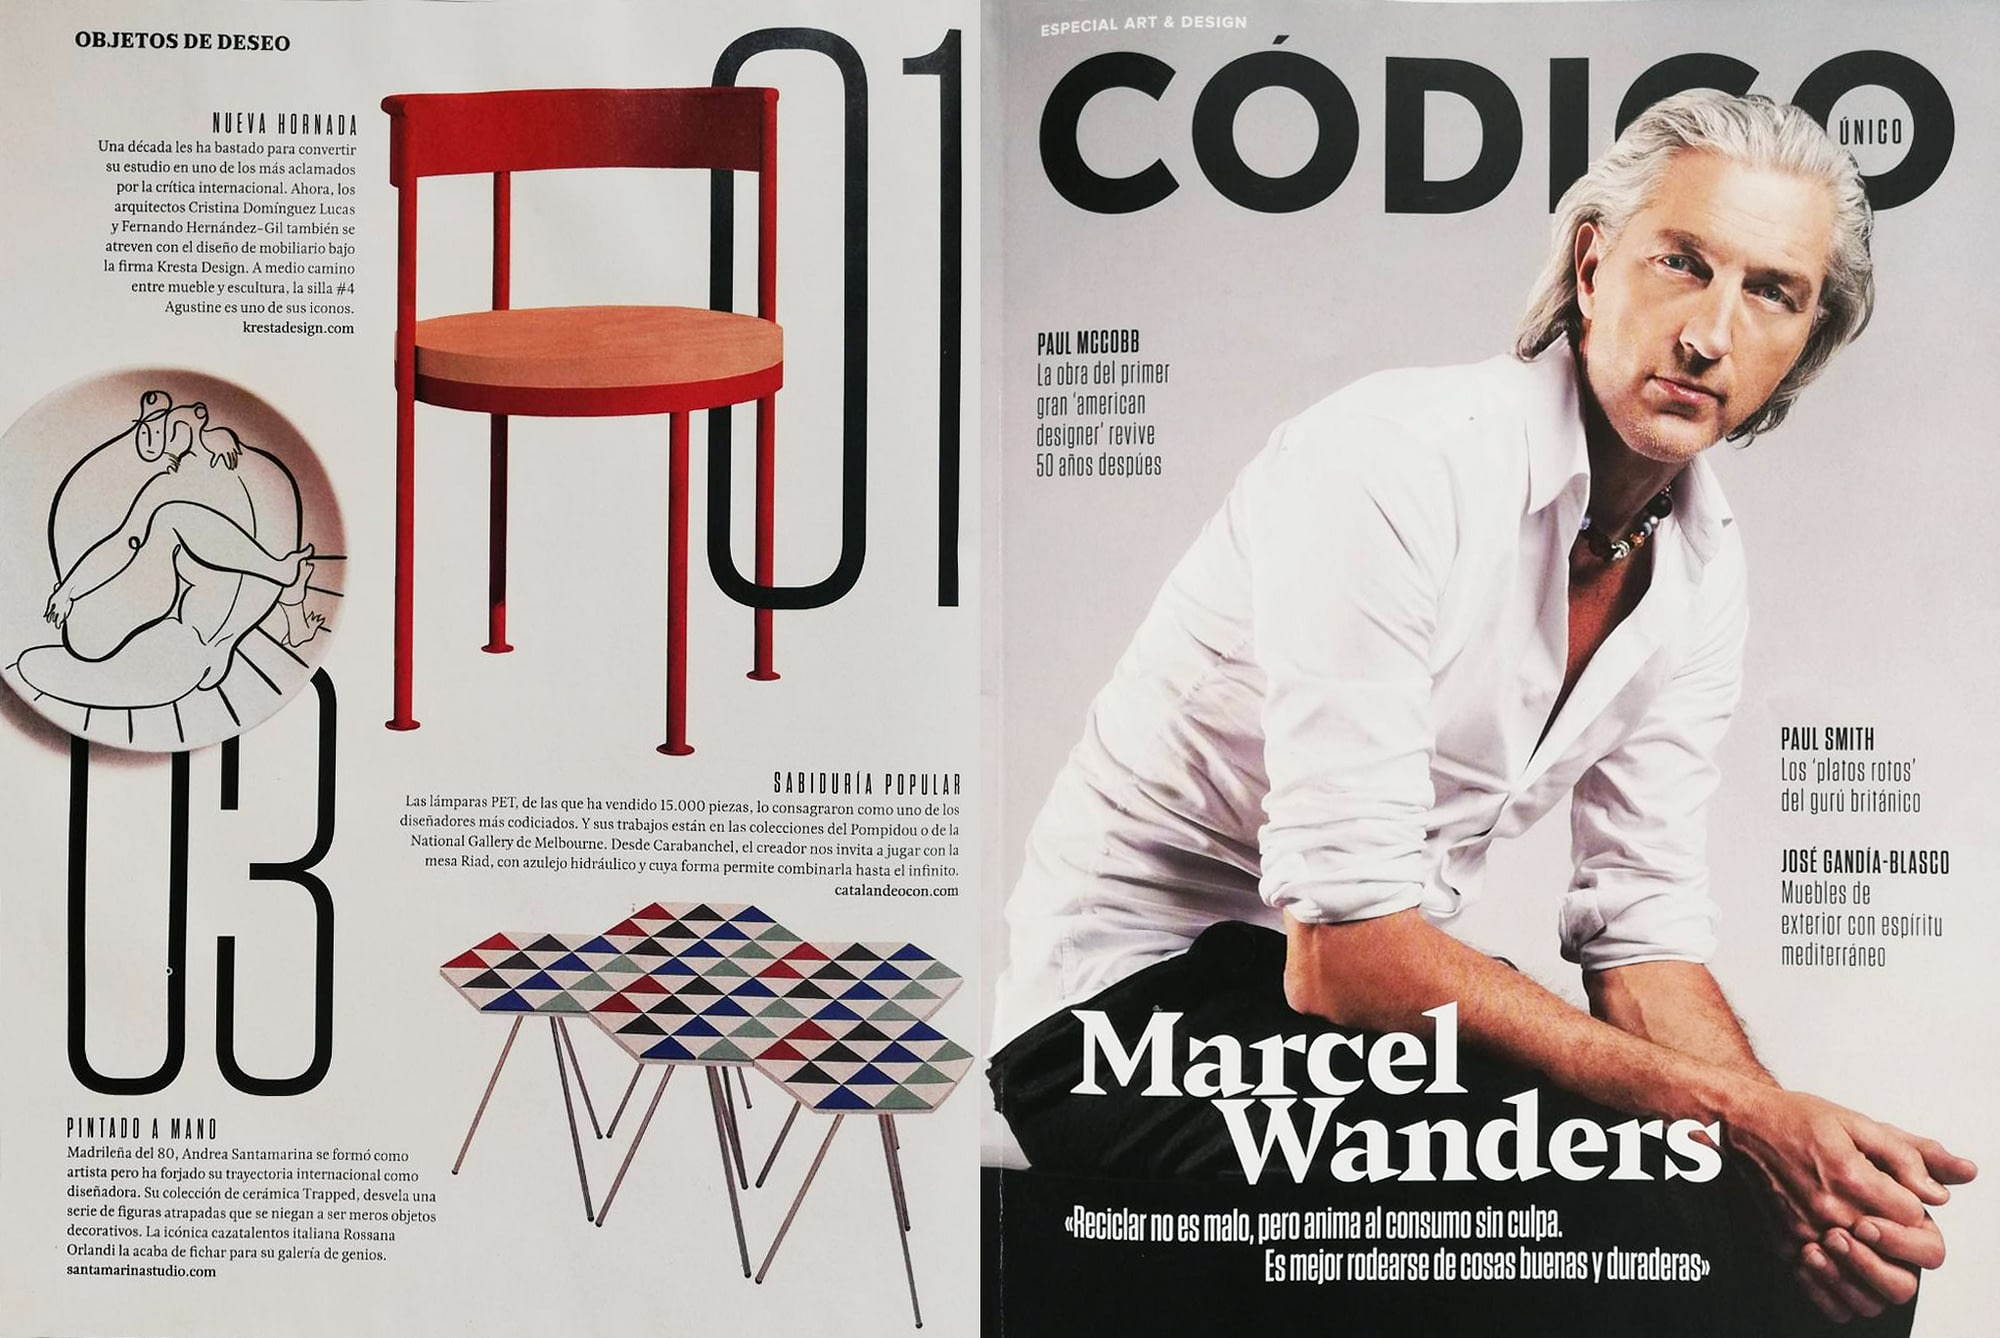 Andrea Santamarina Especial Arte Diseño Código Único ABC